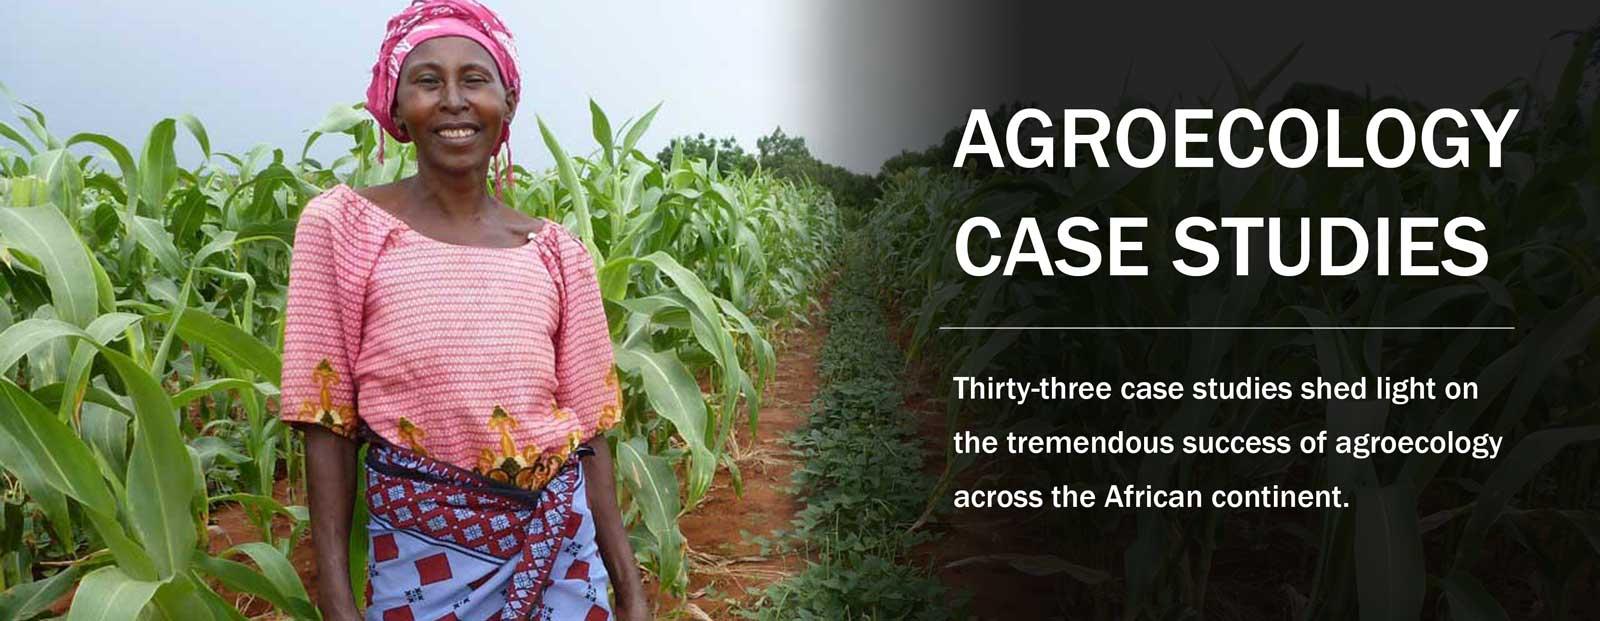 Agroecology Case Studies Slide